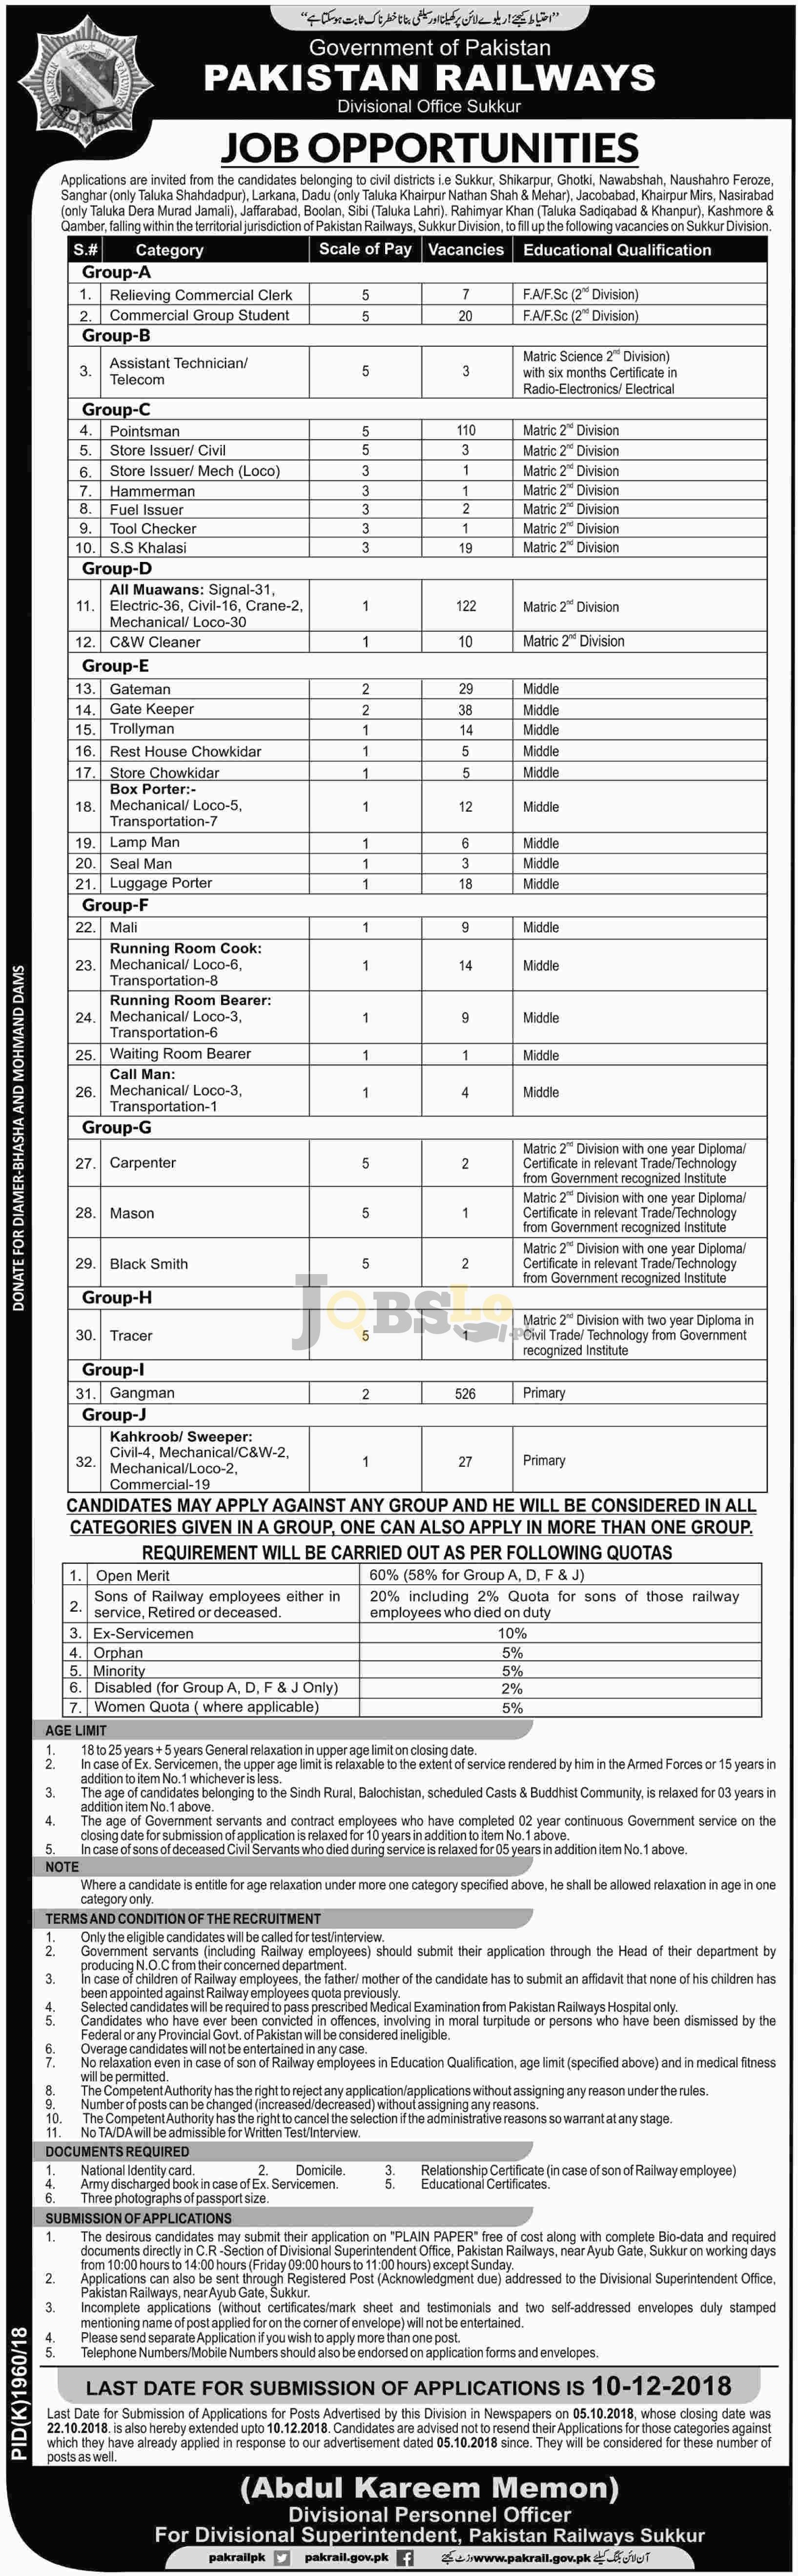 Pakistan Railway Jobs 2018 Sukkur Division Application Form Last Date